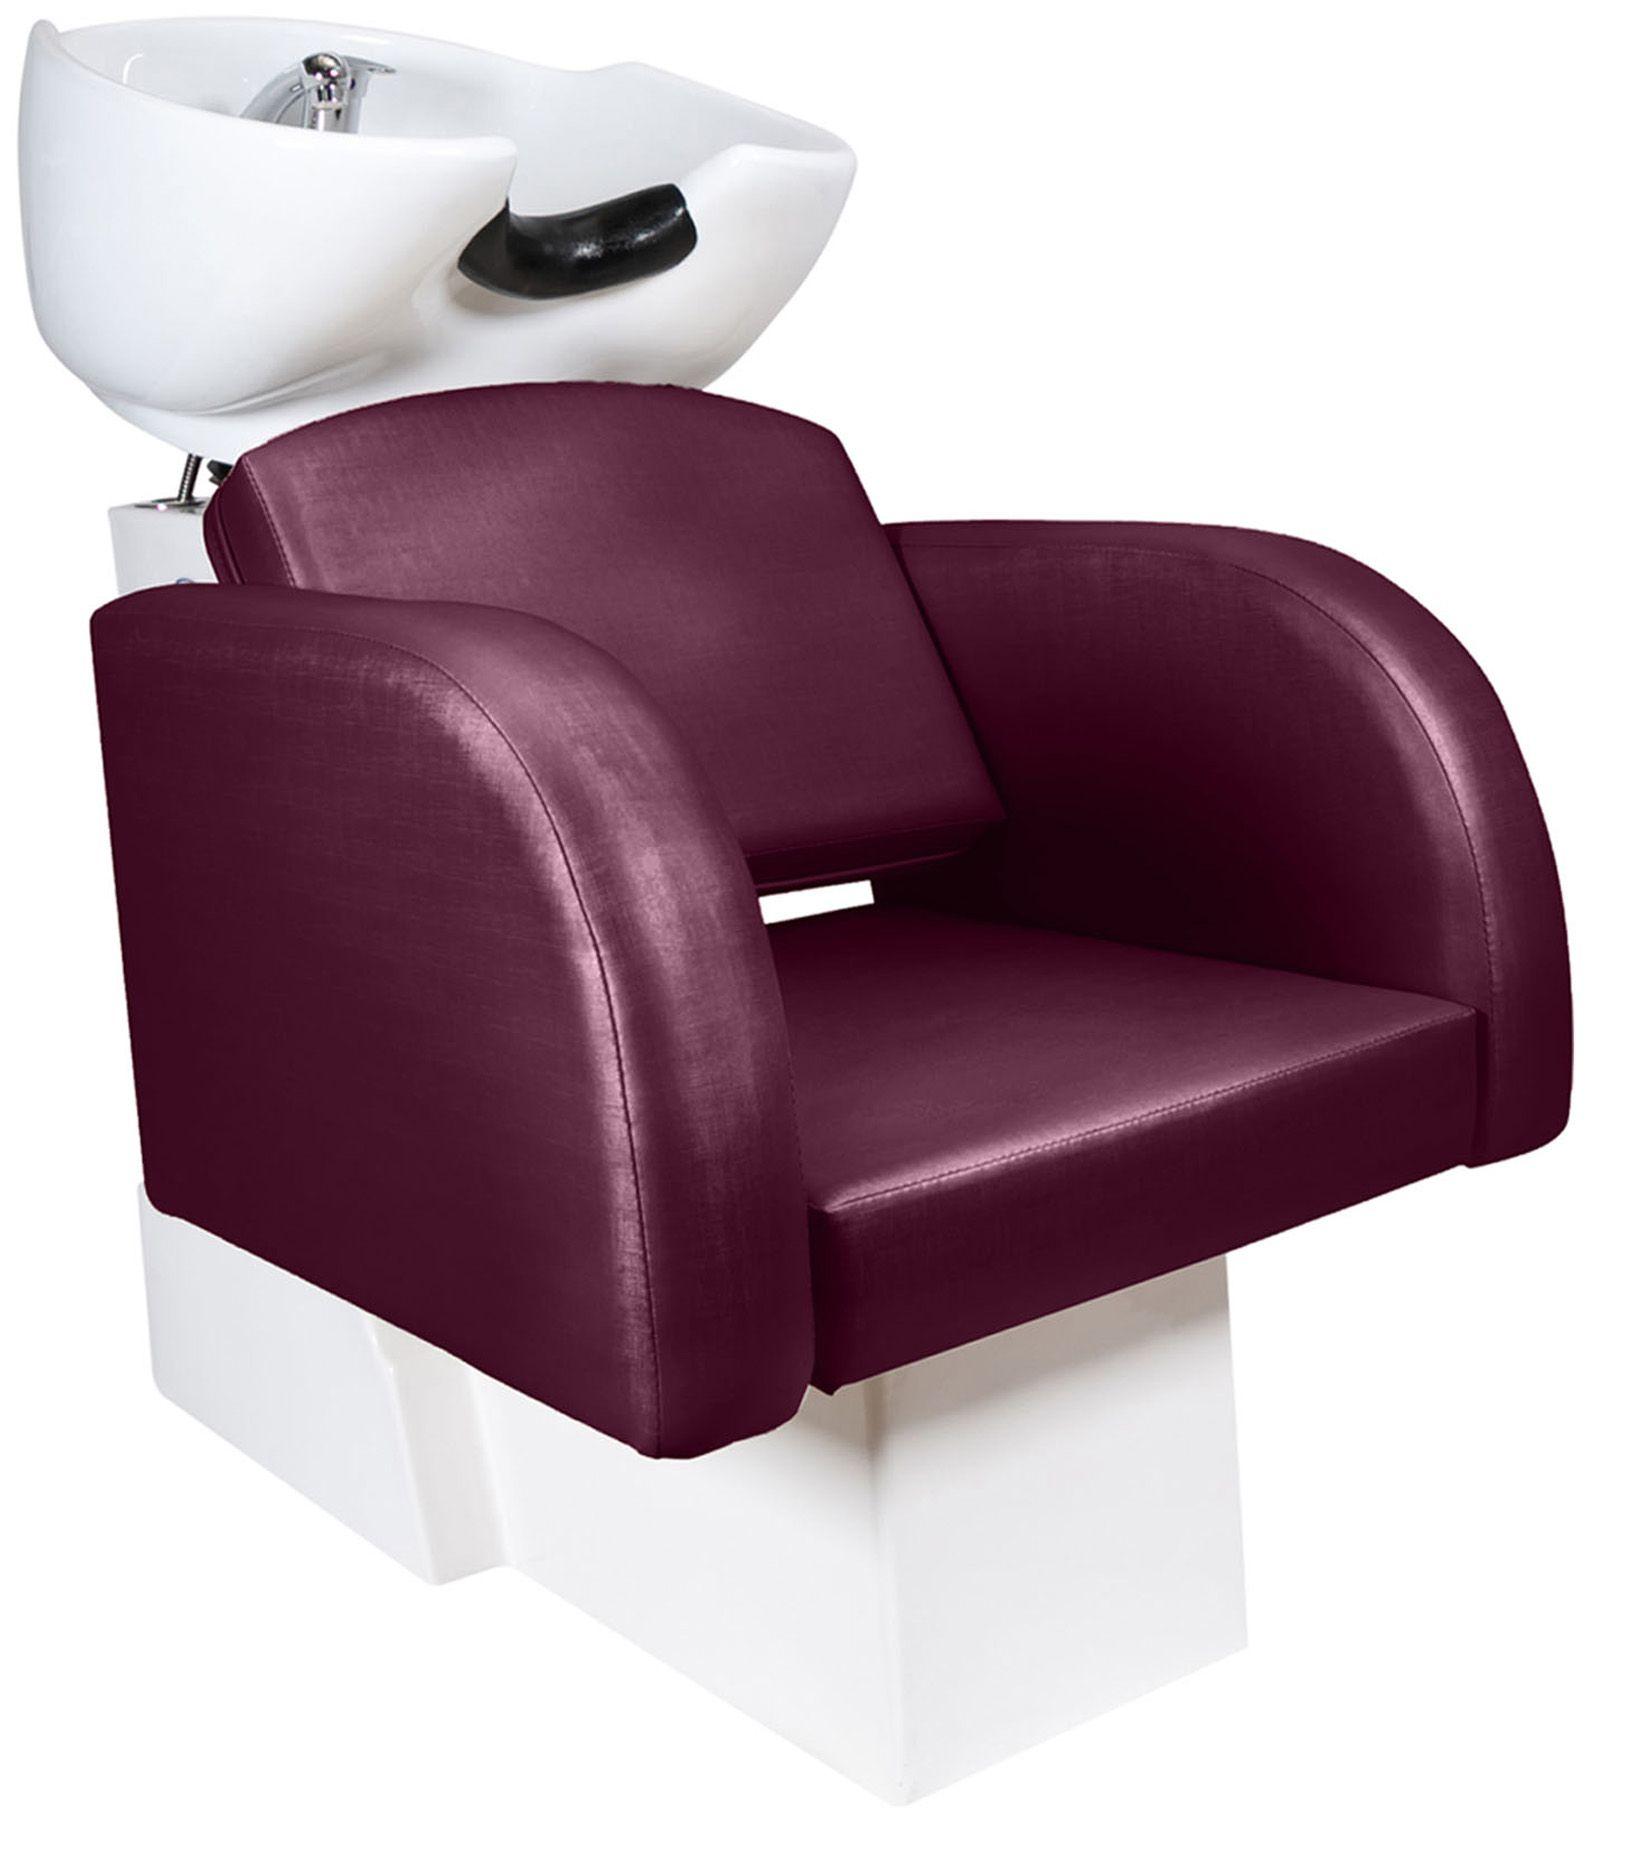 Destak Bordo - Lavatorio + Cadeira Hidráulica Fixa